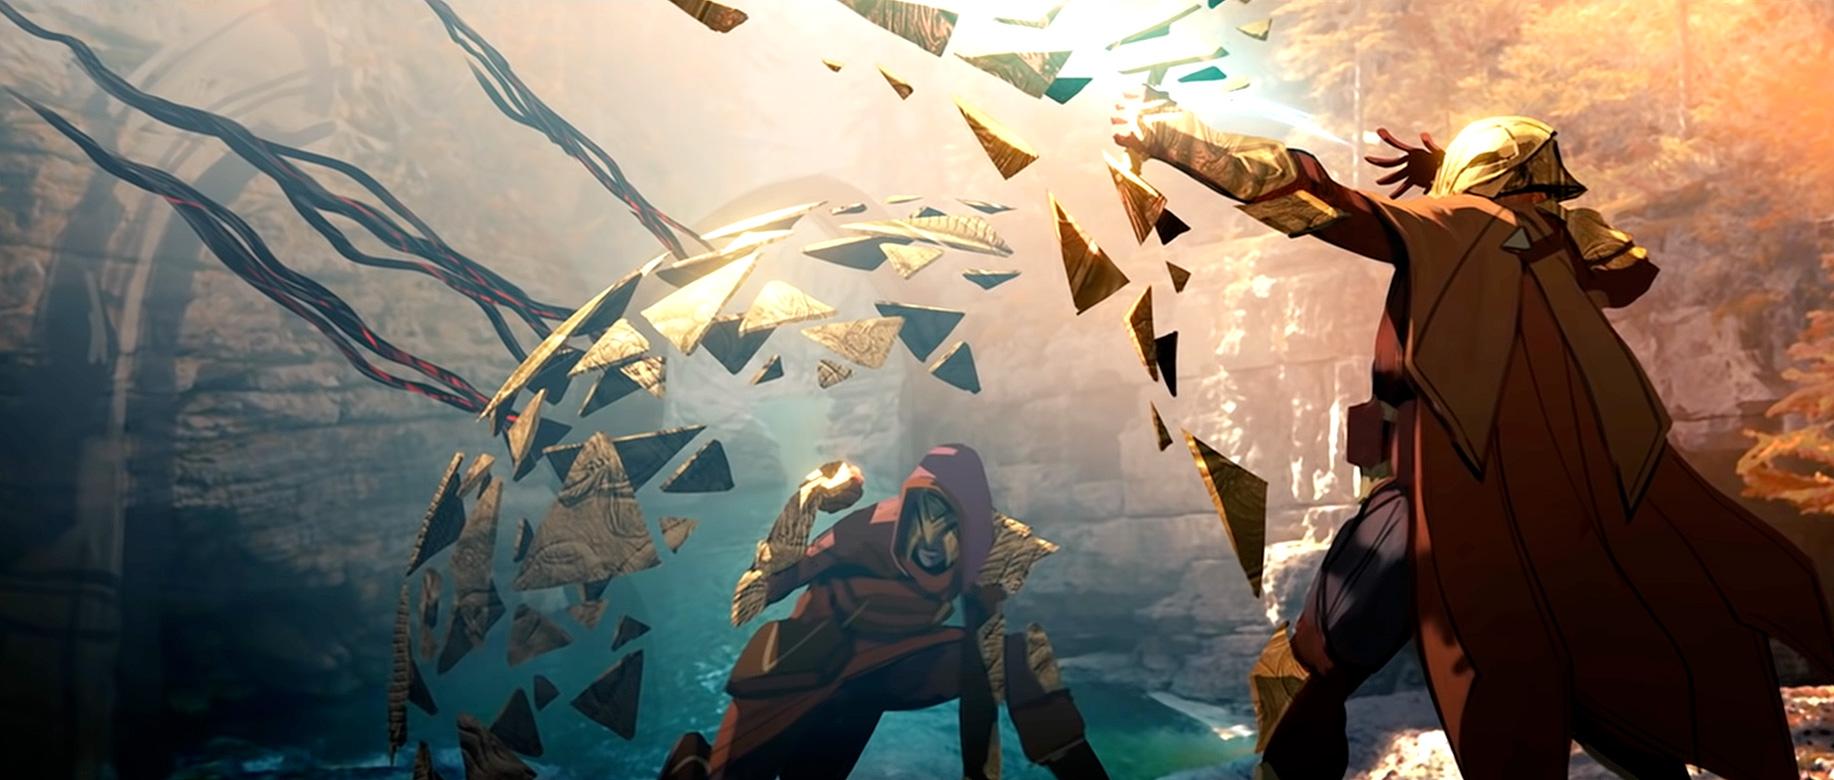 Dragon Age 4 - Concept Art